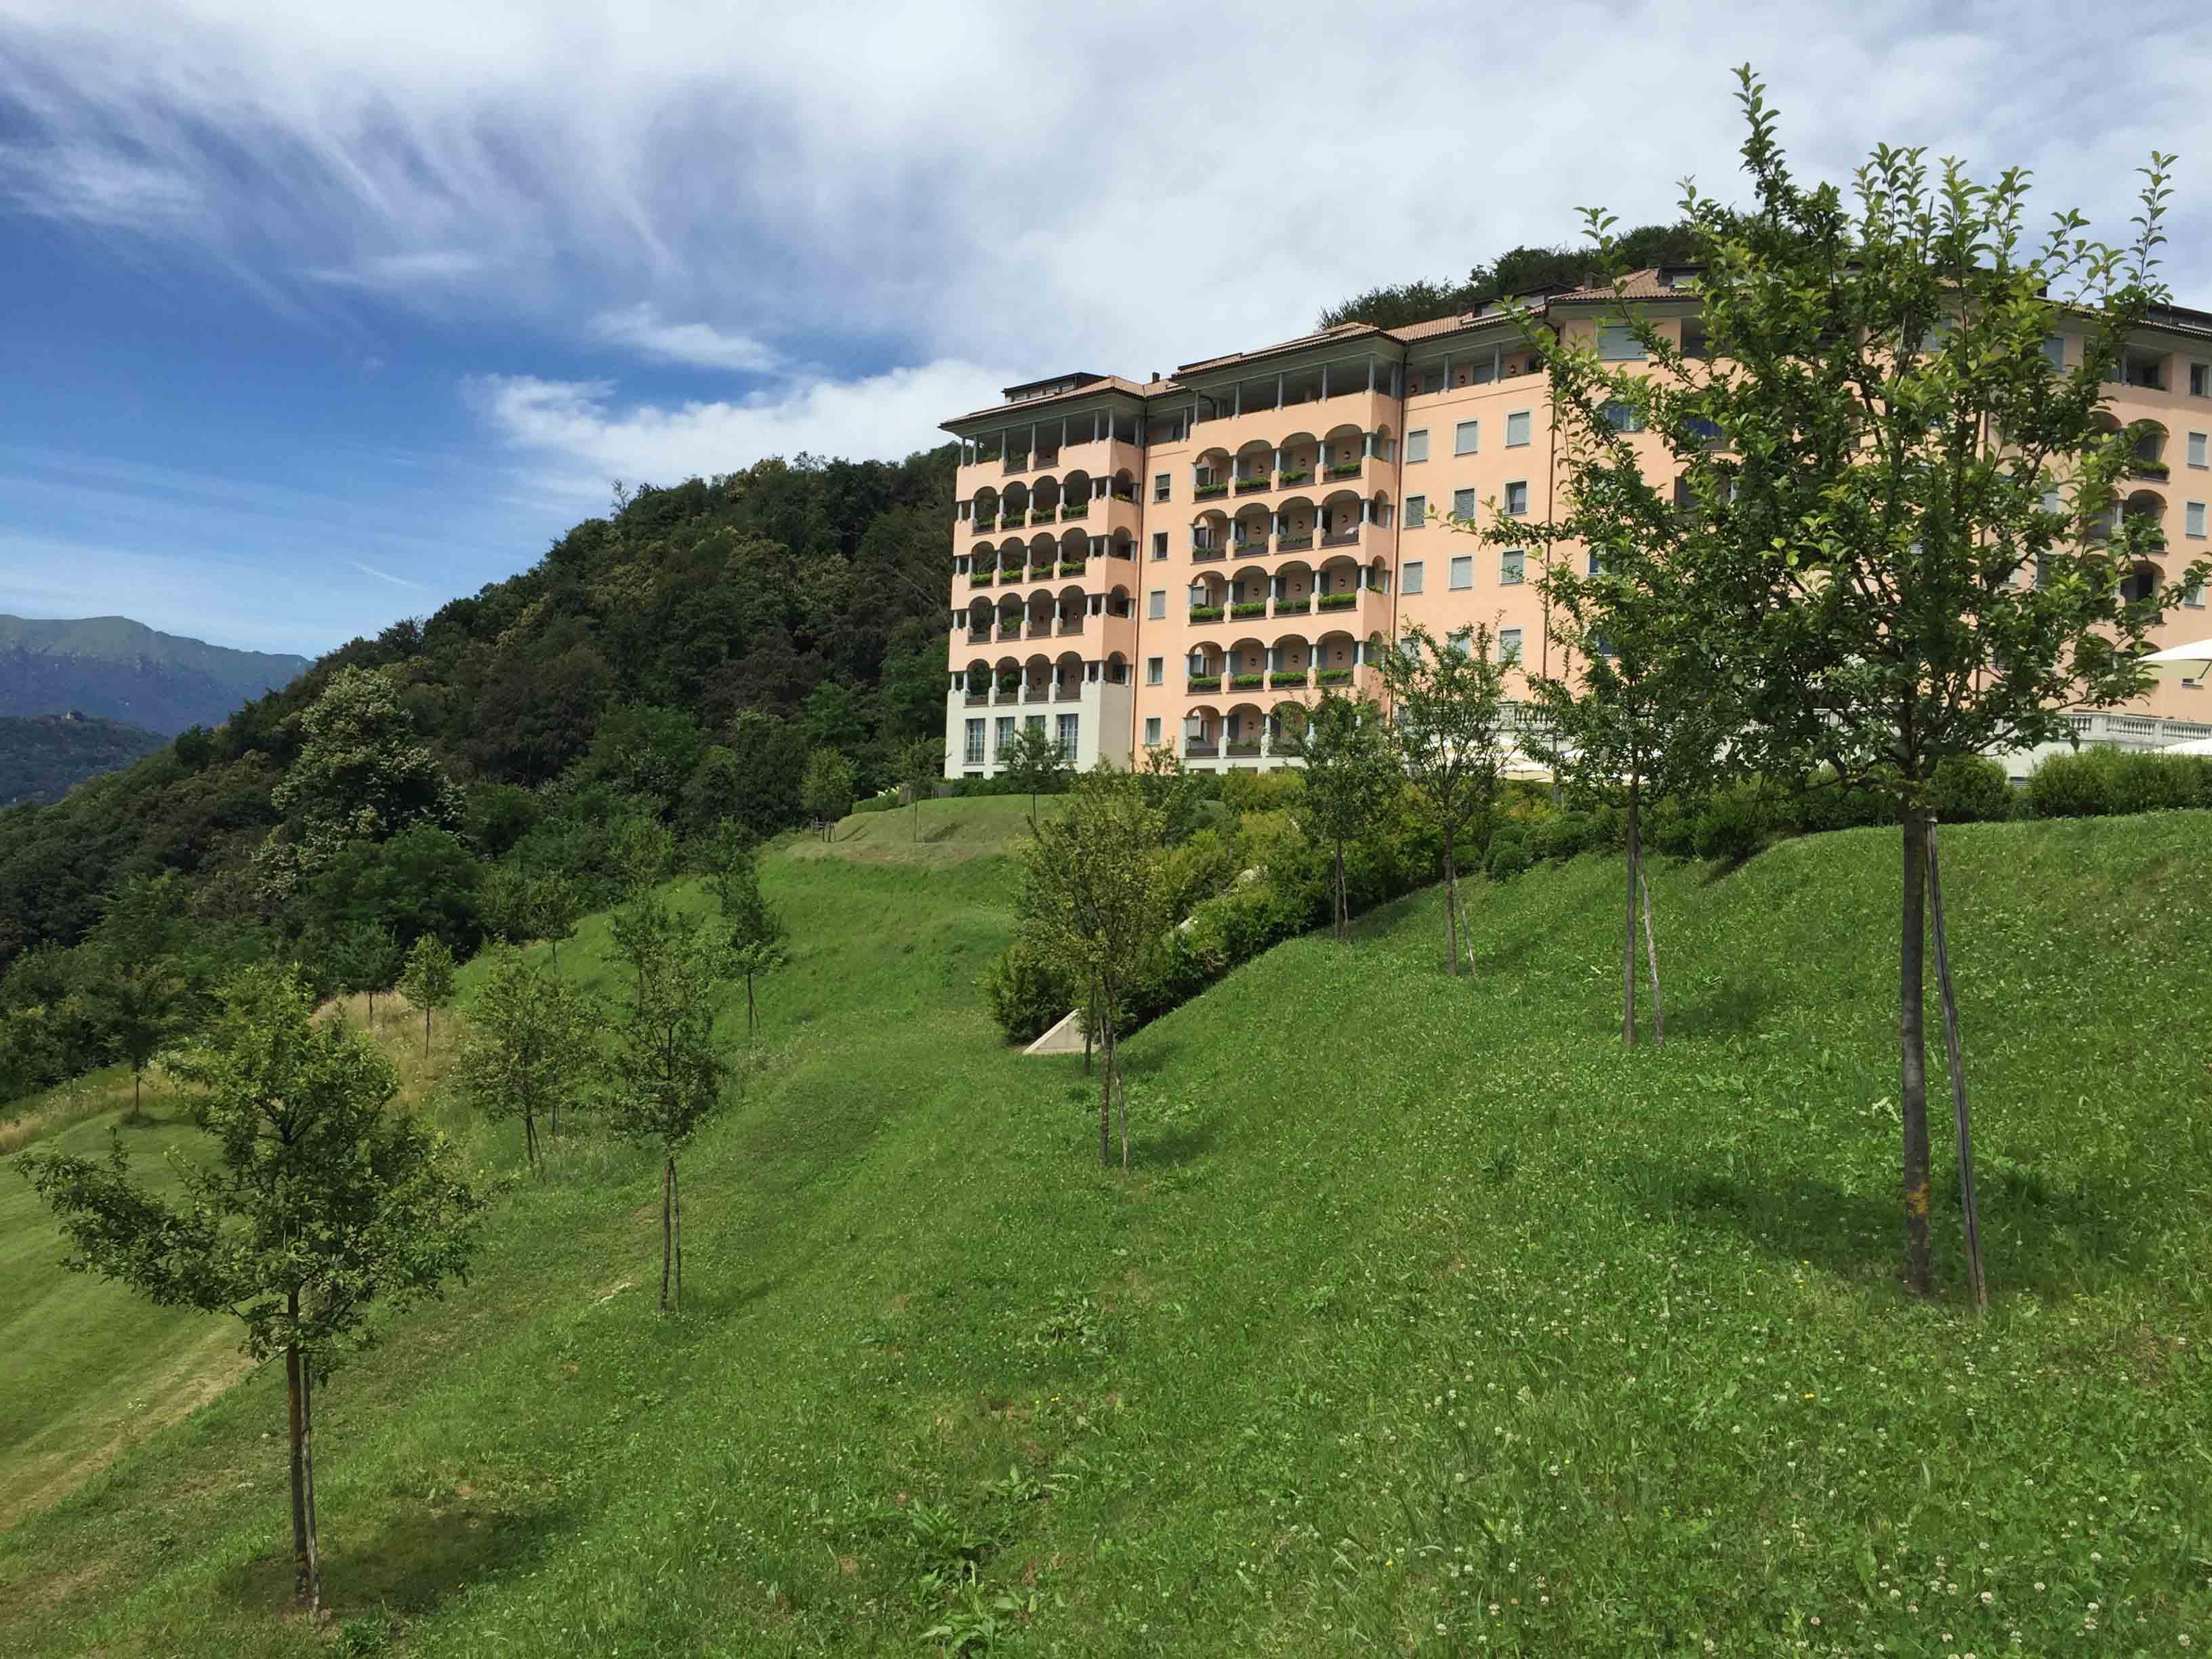 Resort Collina d'Oro - Hotels Resort & Spa